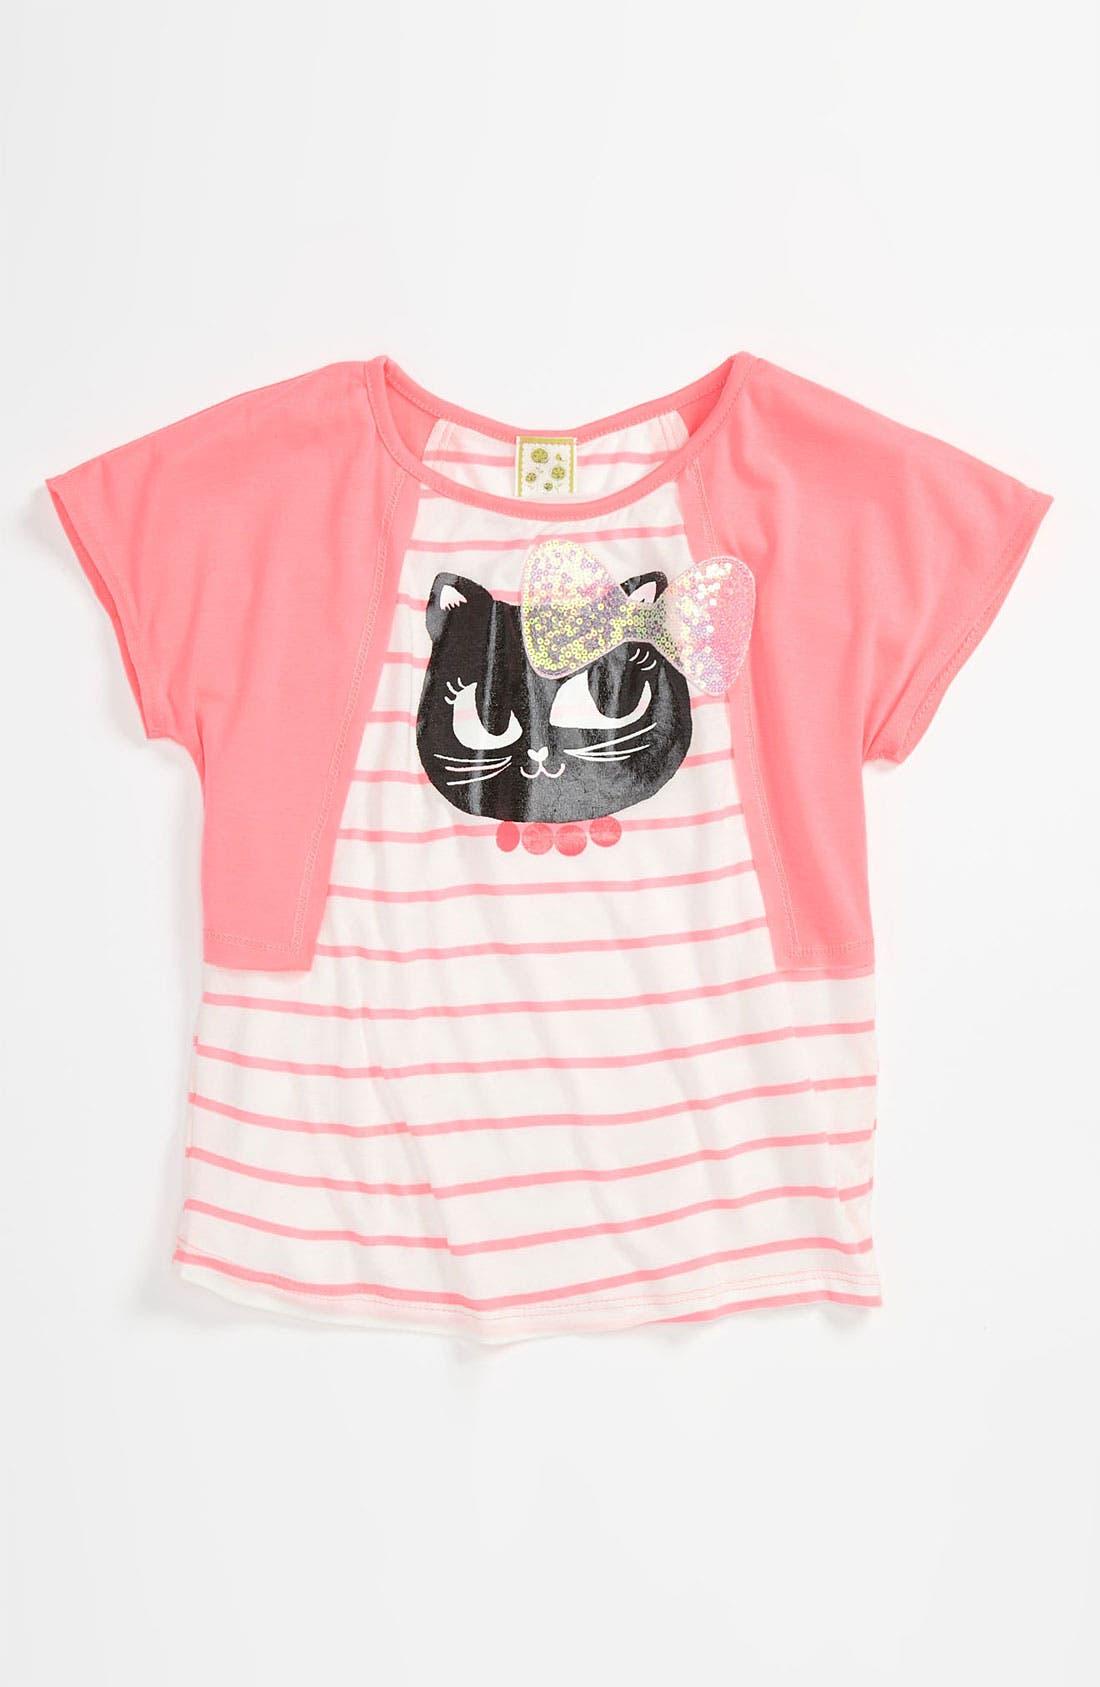 Main Image - Kiddo 'Cat' Tee (Little Girls)